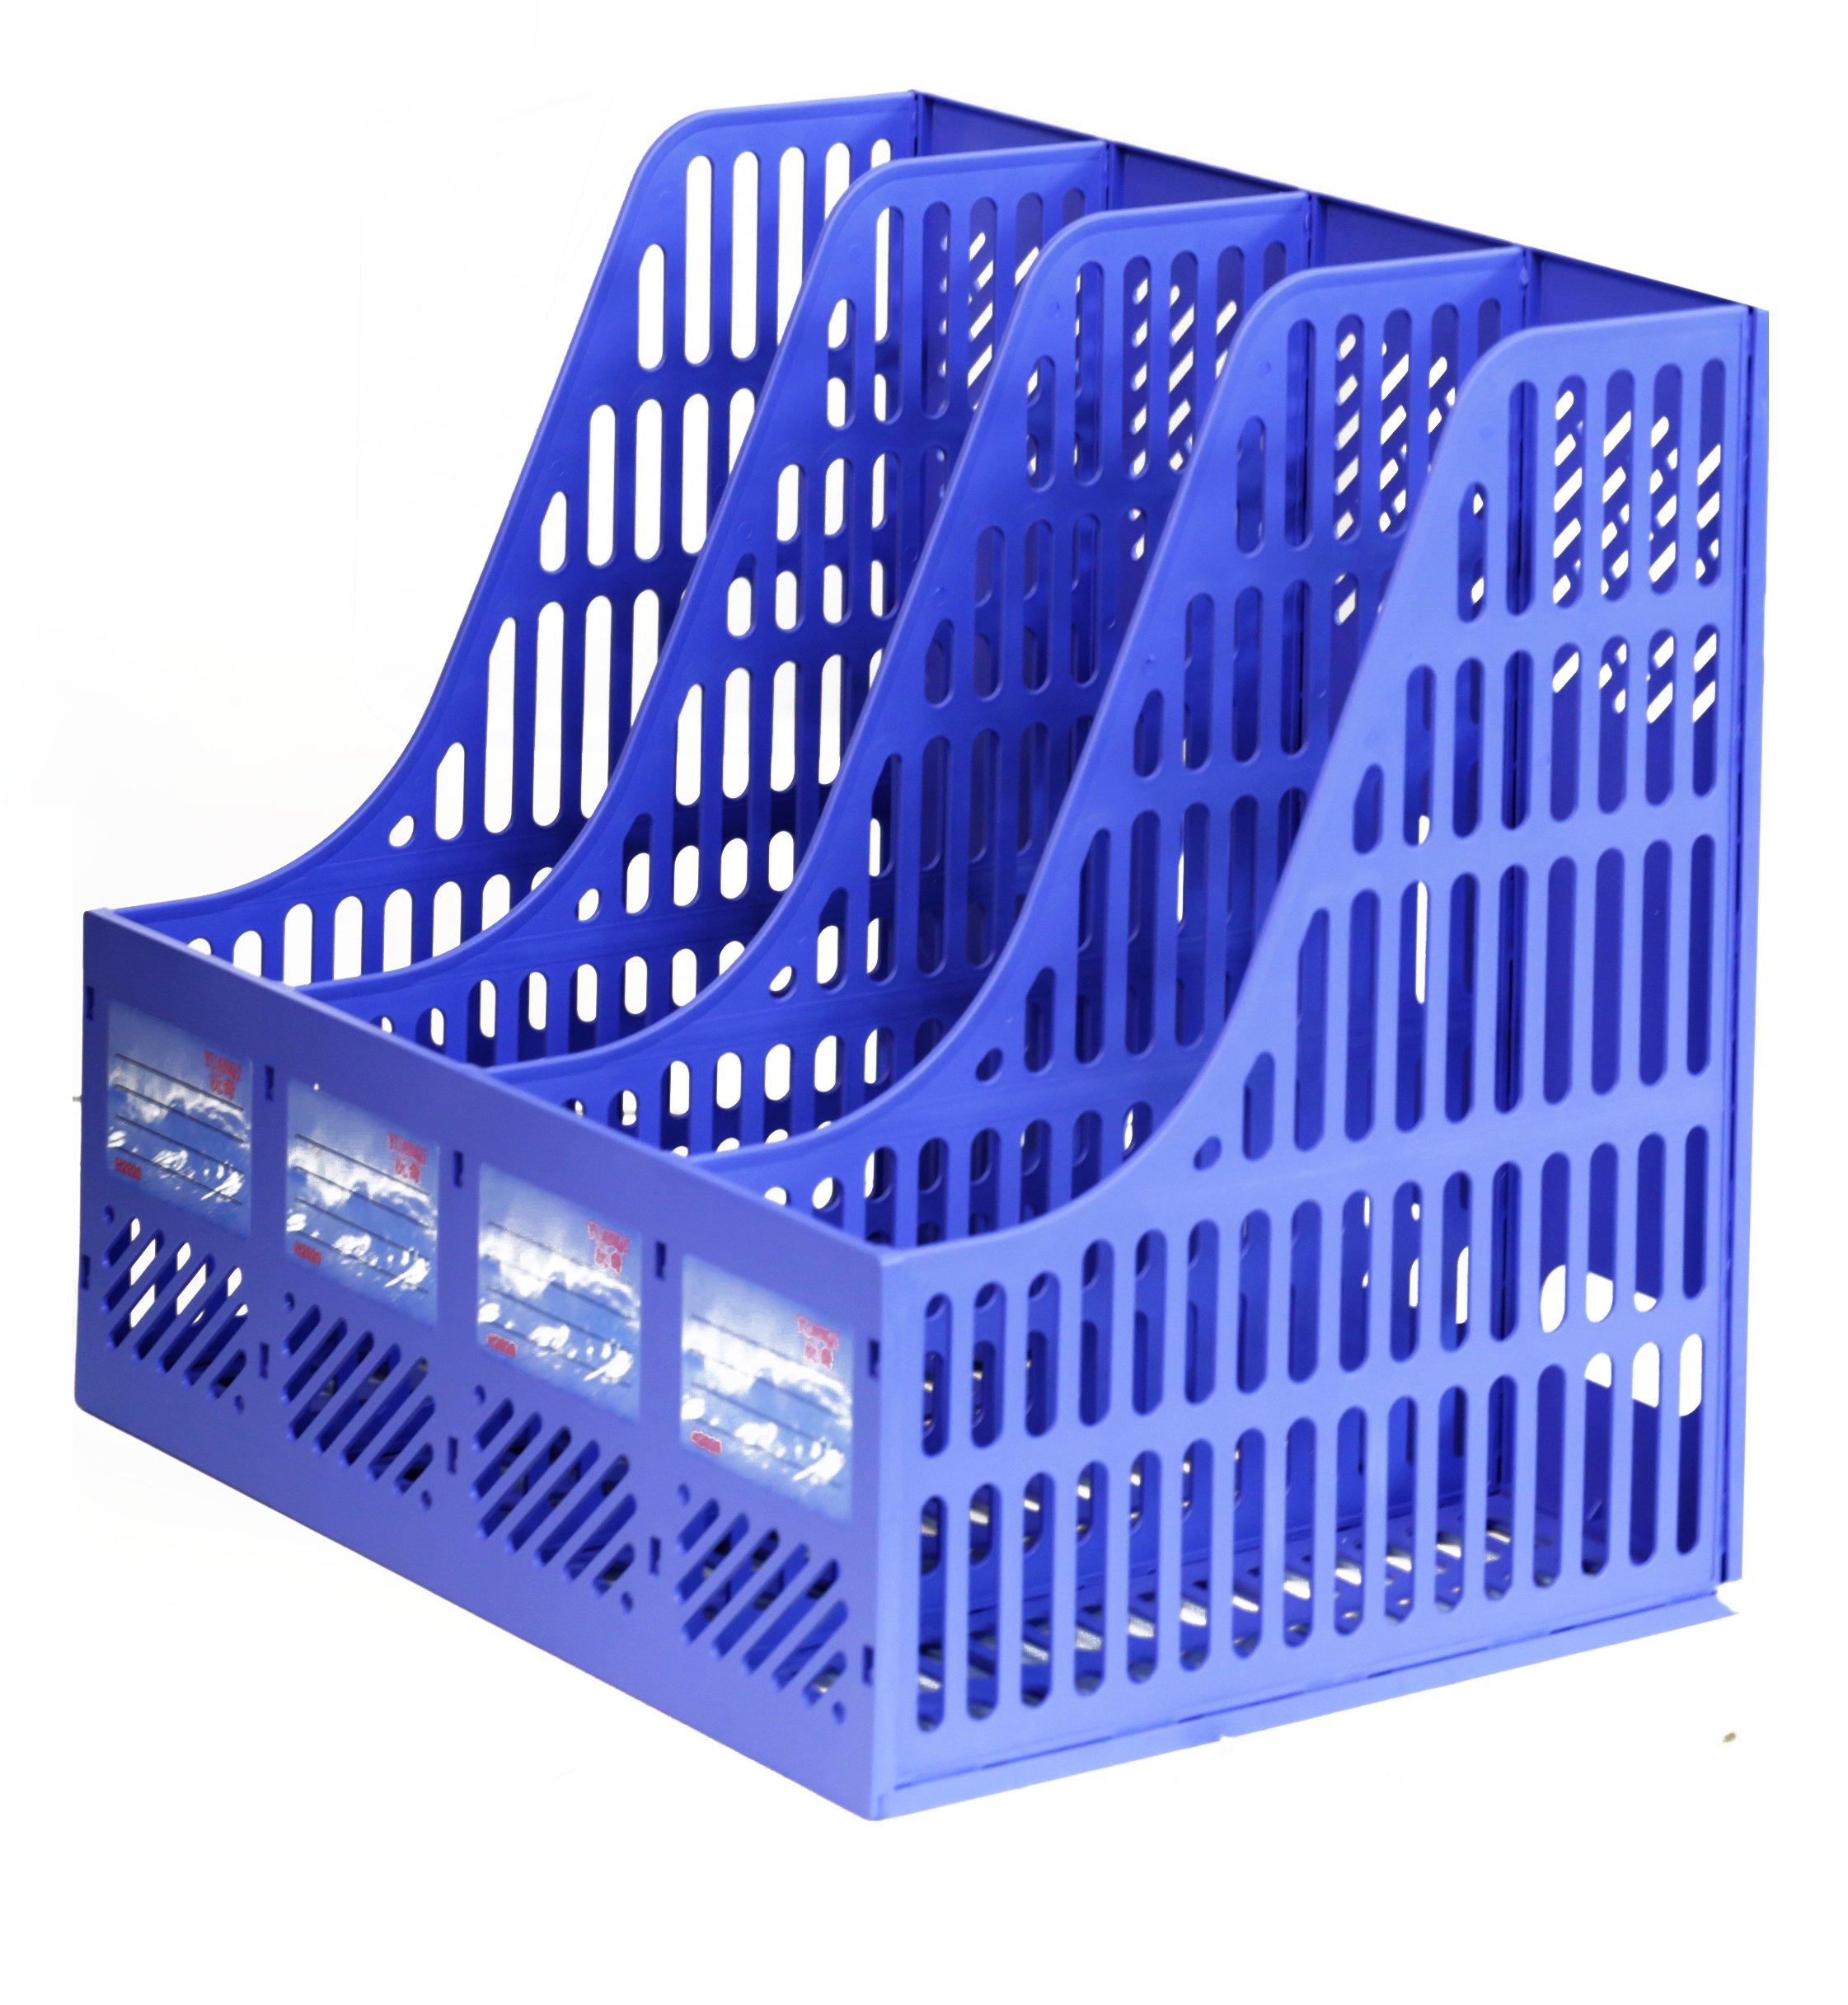 4 Slots, File Folder Organizer, Mail Organizer, File Organizer, Magazine Literature, Document Holder, Office School Home Desk File Holder, Rack Case Box Crate Organizer (2 Pack)